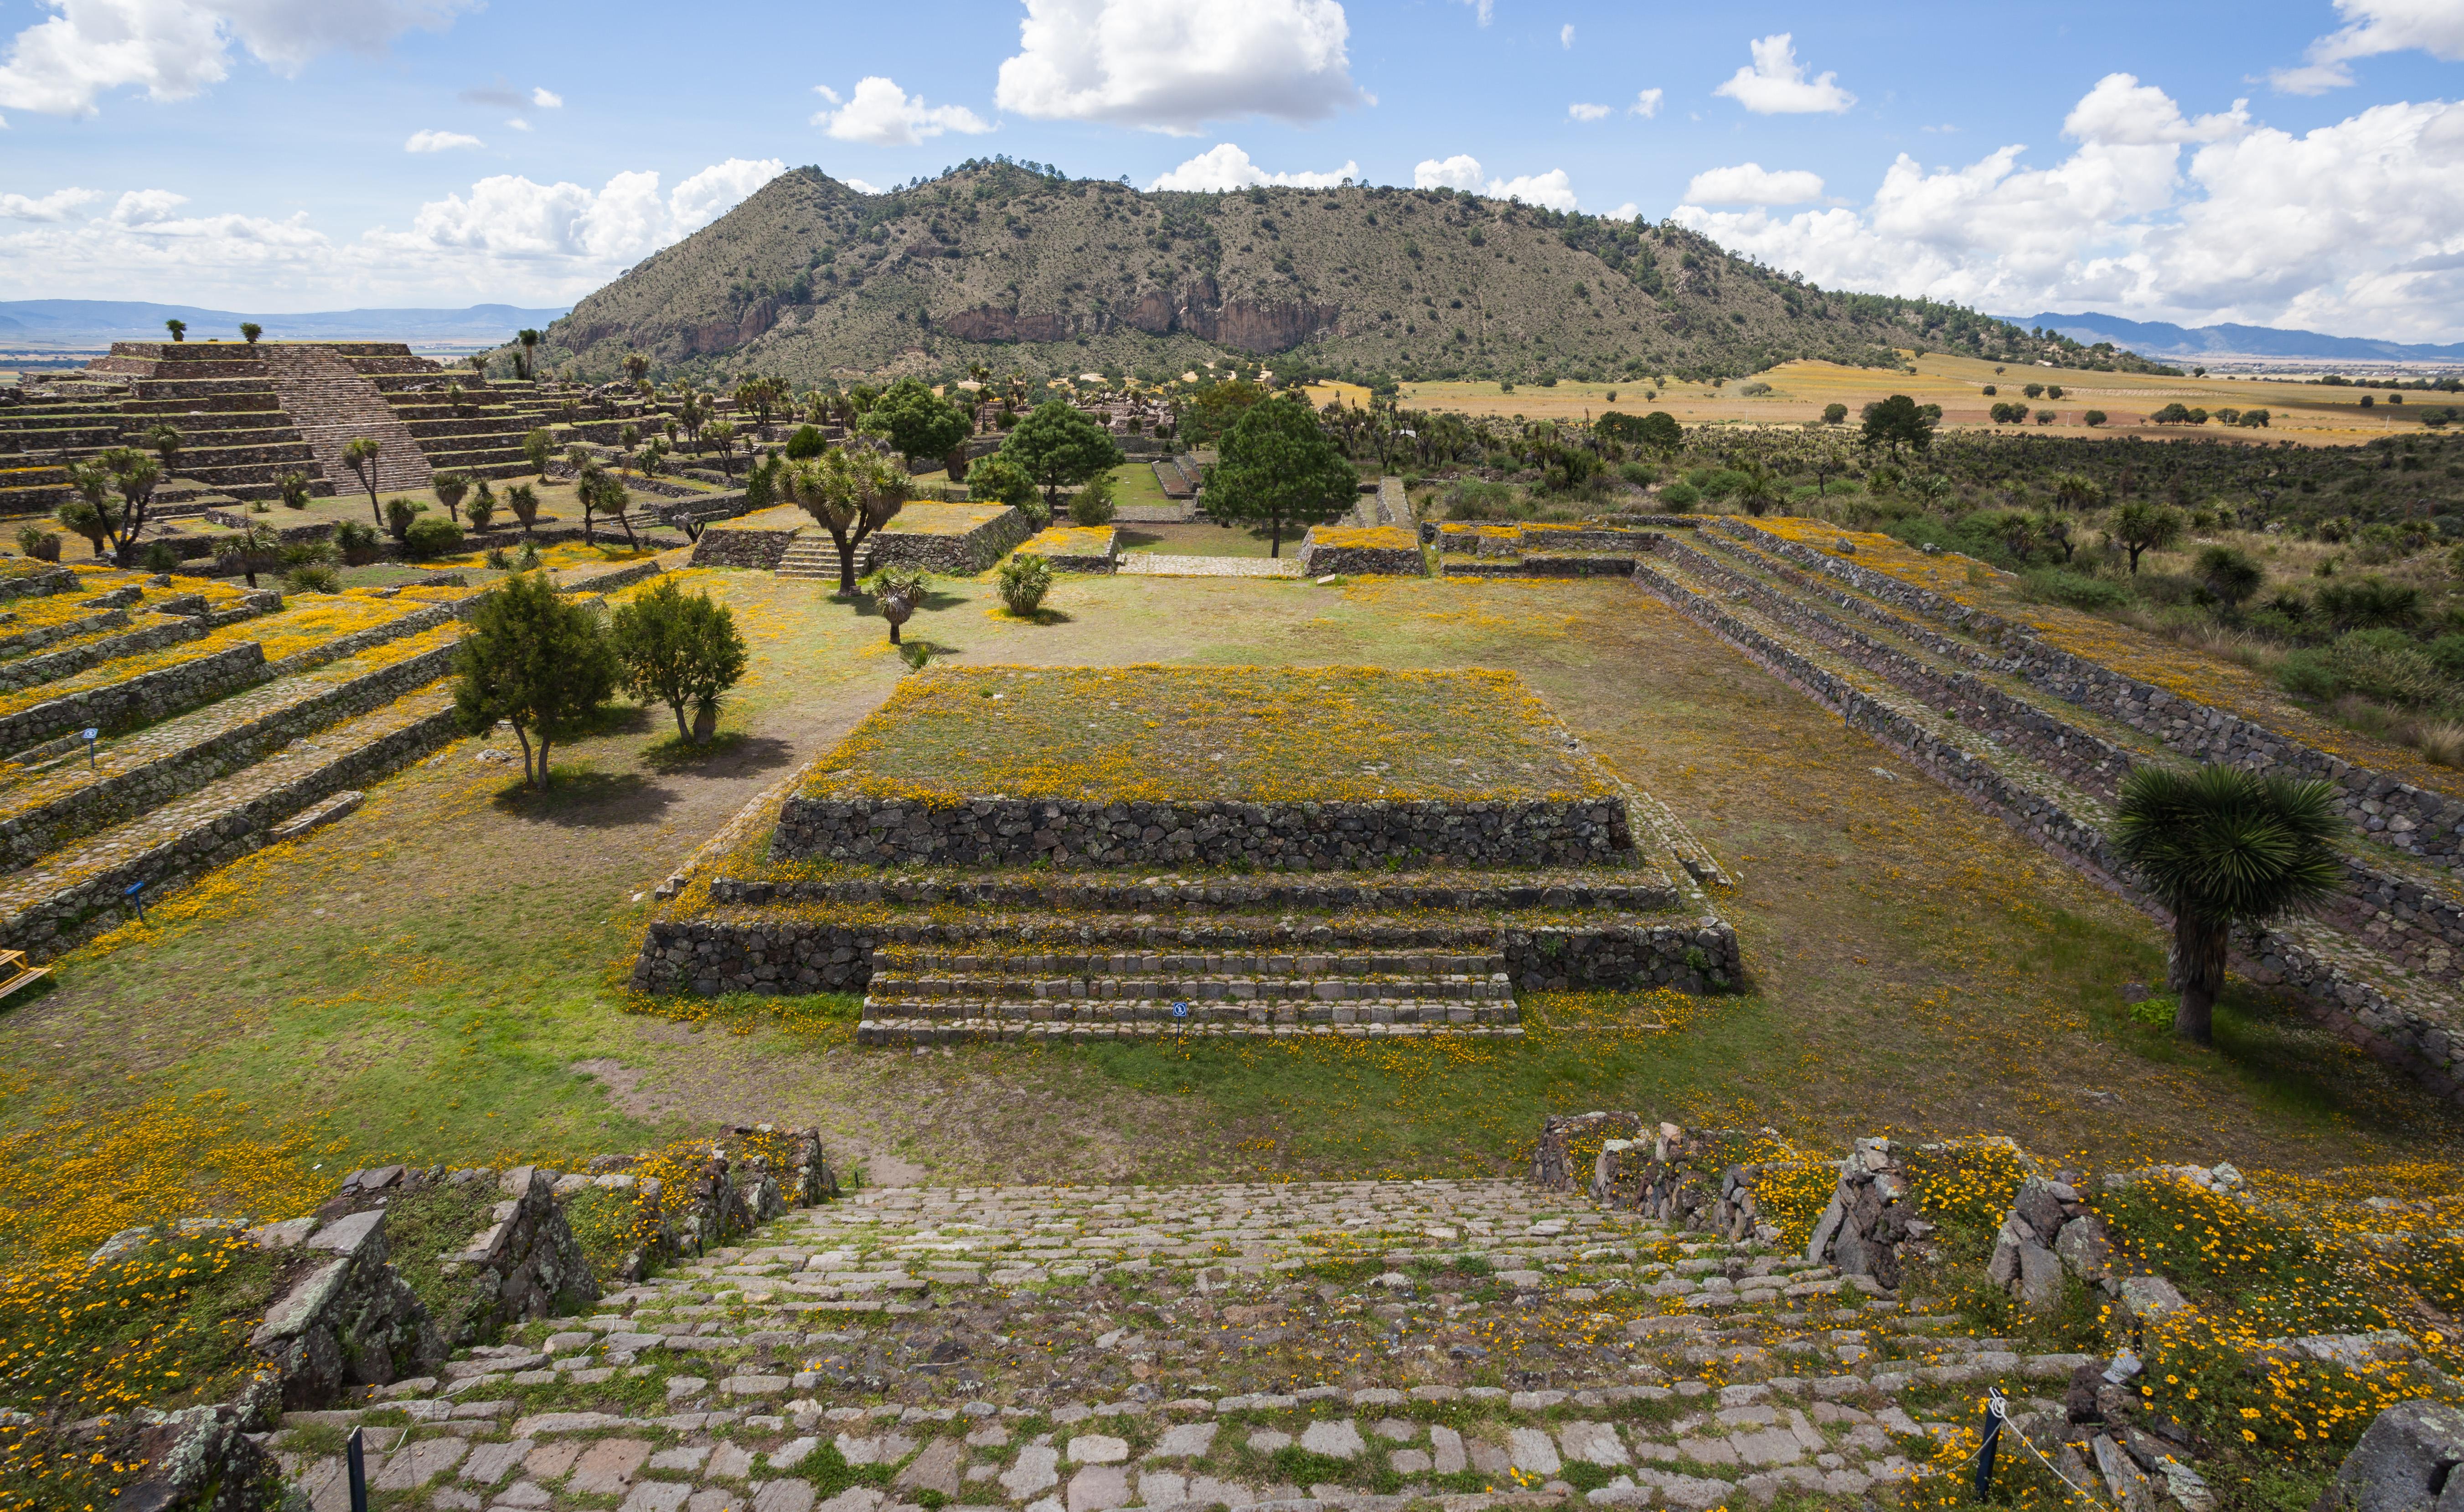 File:Zona arqueológica de Cantona, Puebla, México, 2013-10